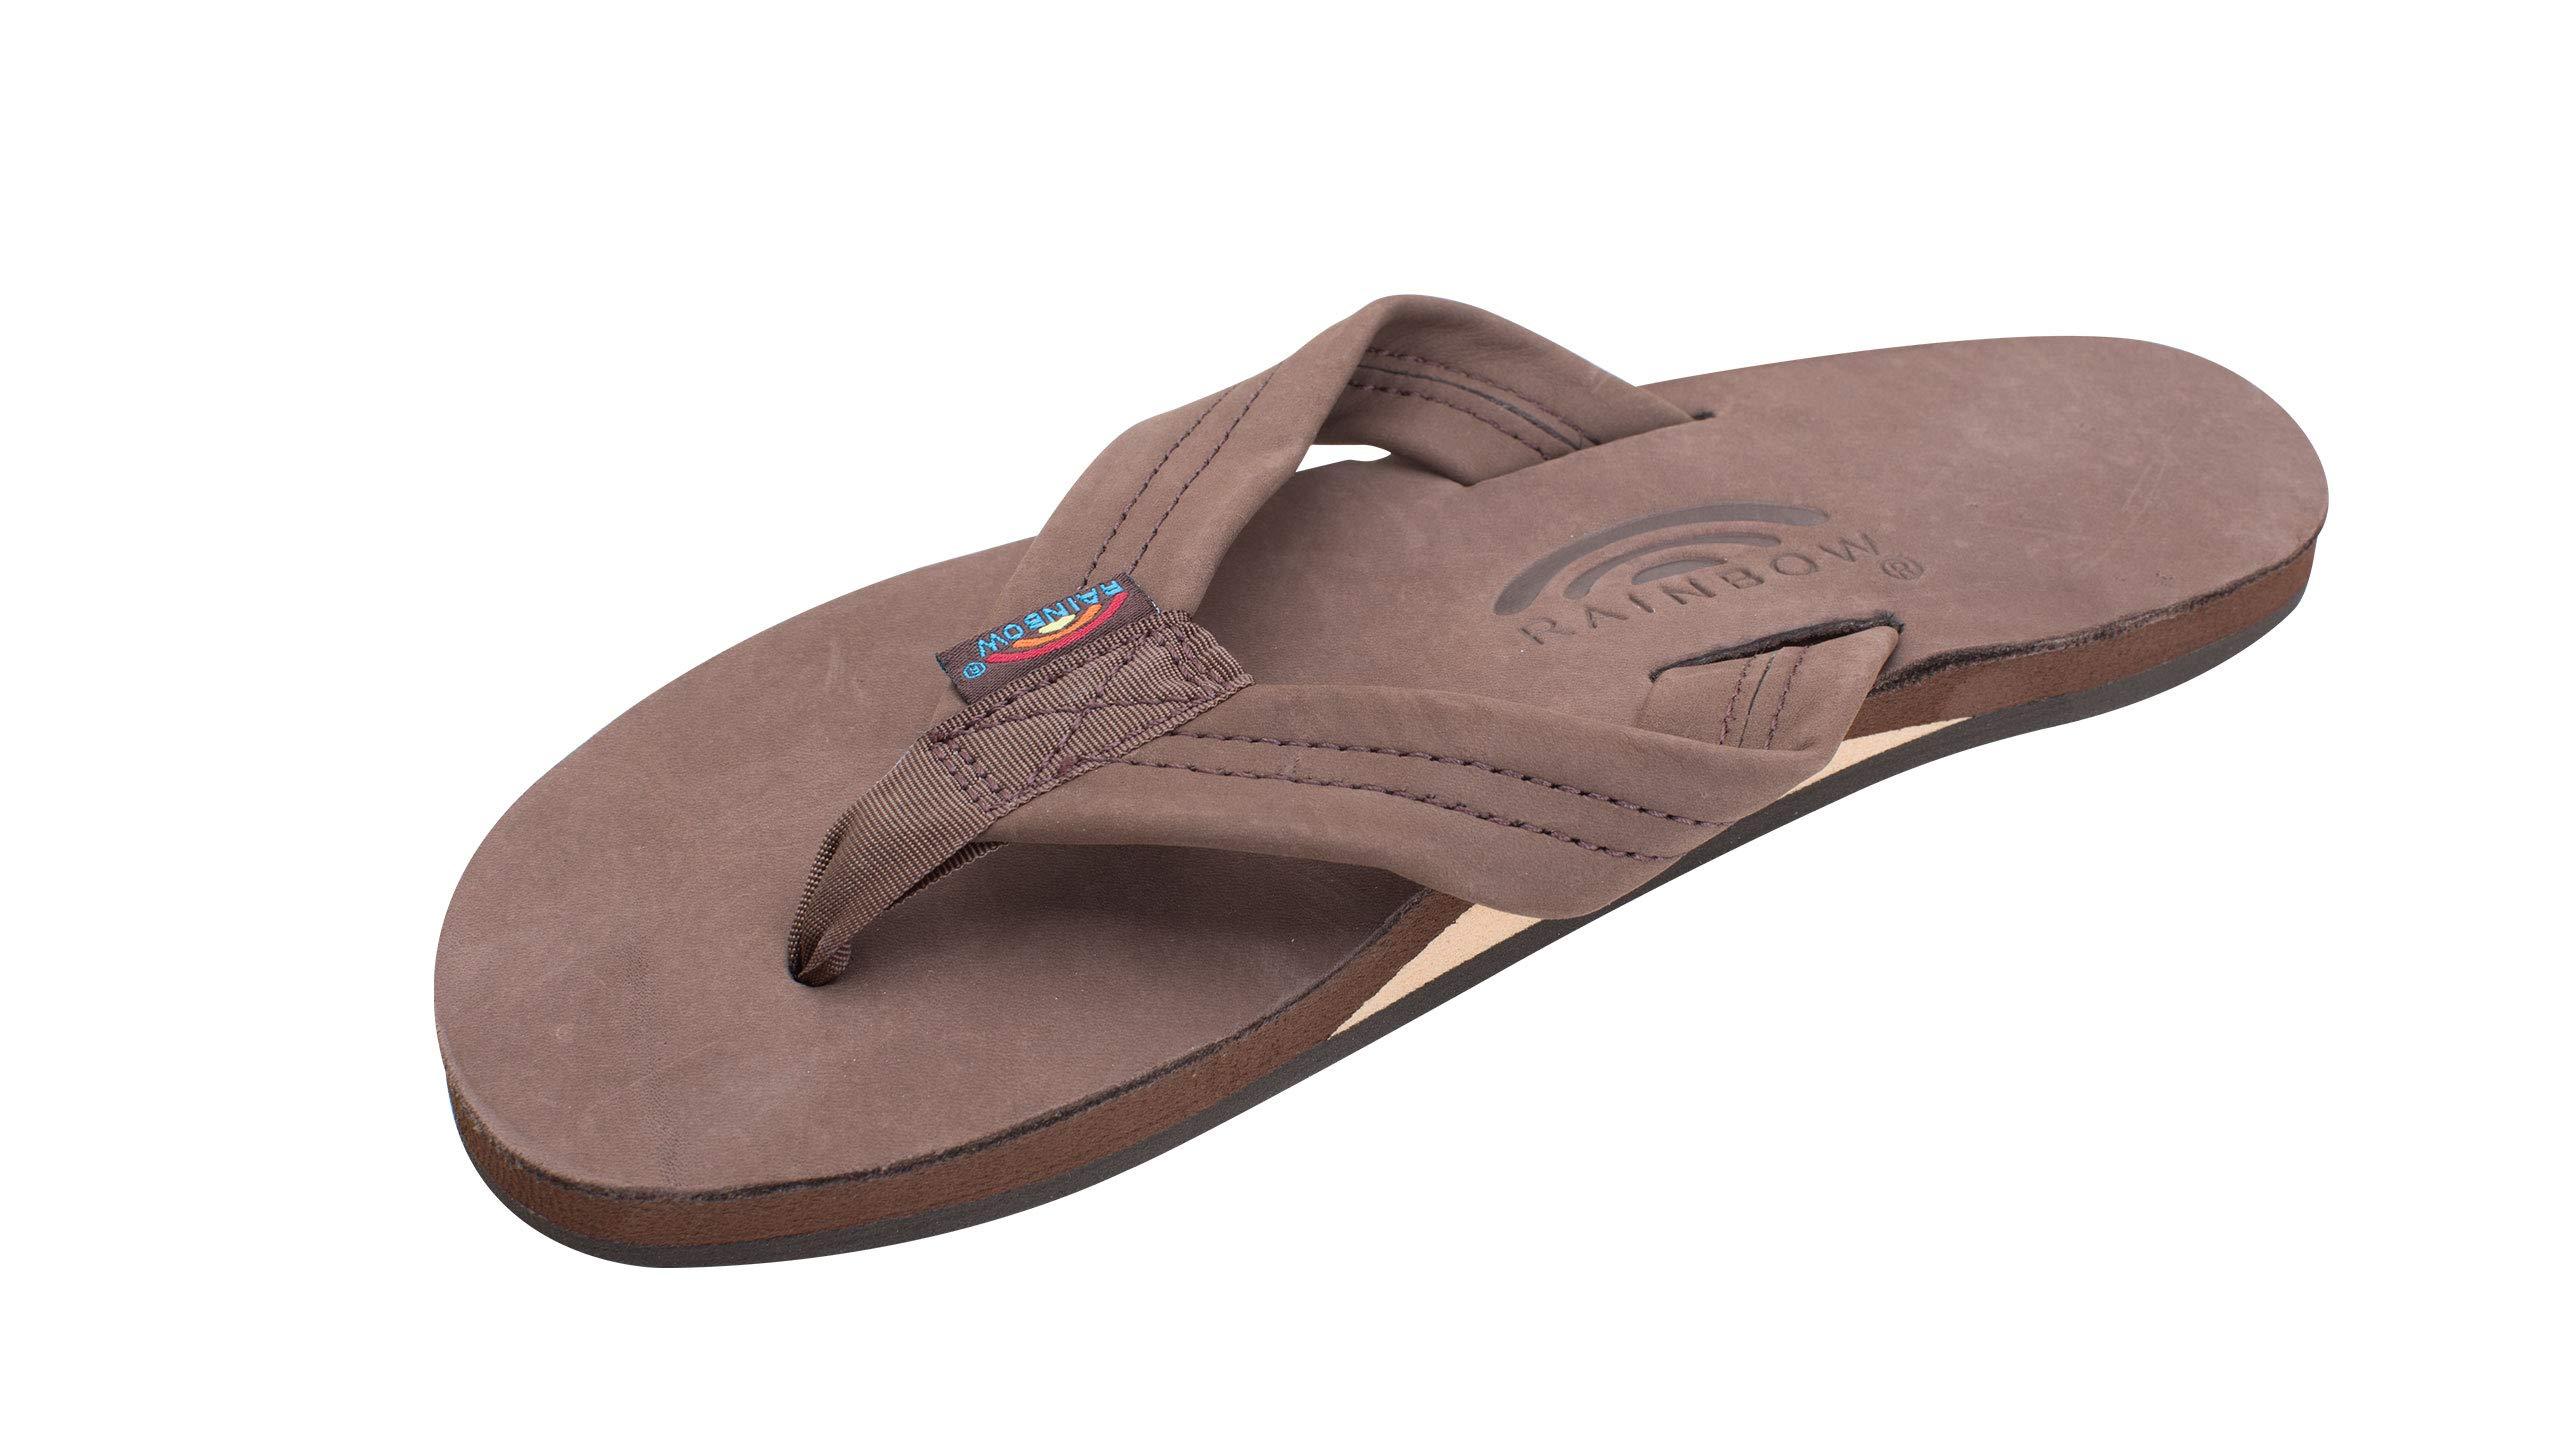 Rainbow Sandals Women's Single Layer Premier Leather Expresso, Large / 7.5-8.5 B(M) US